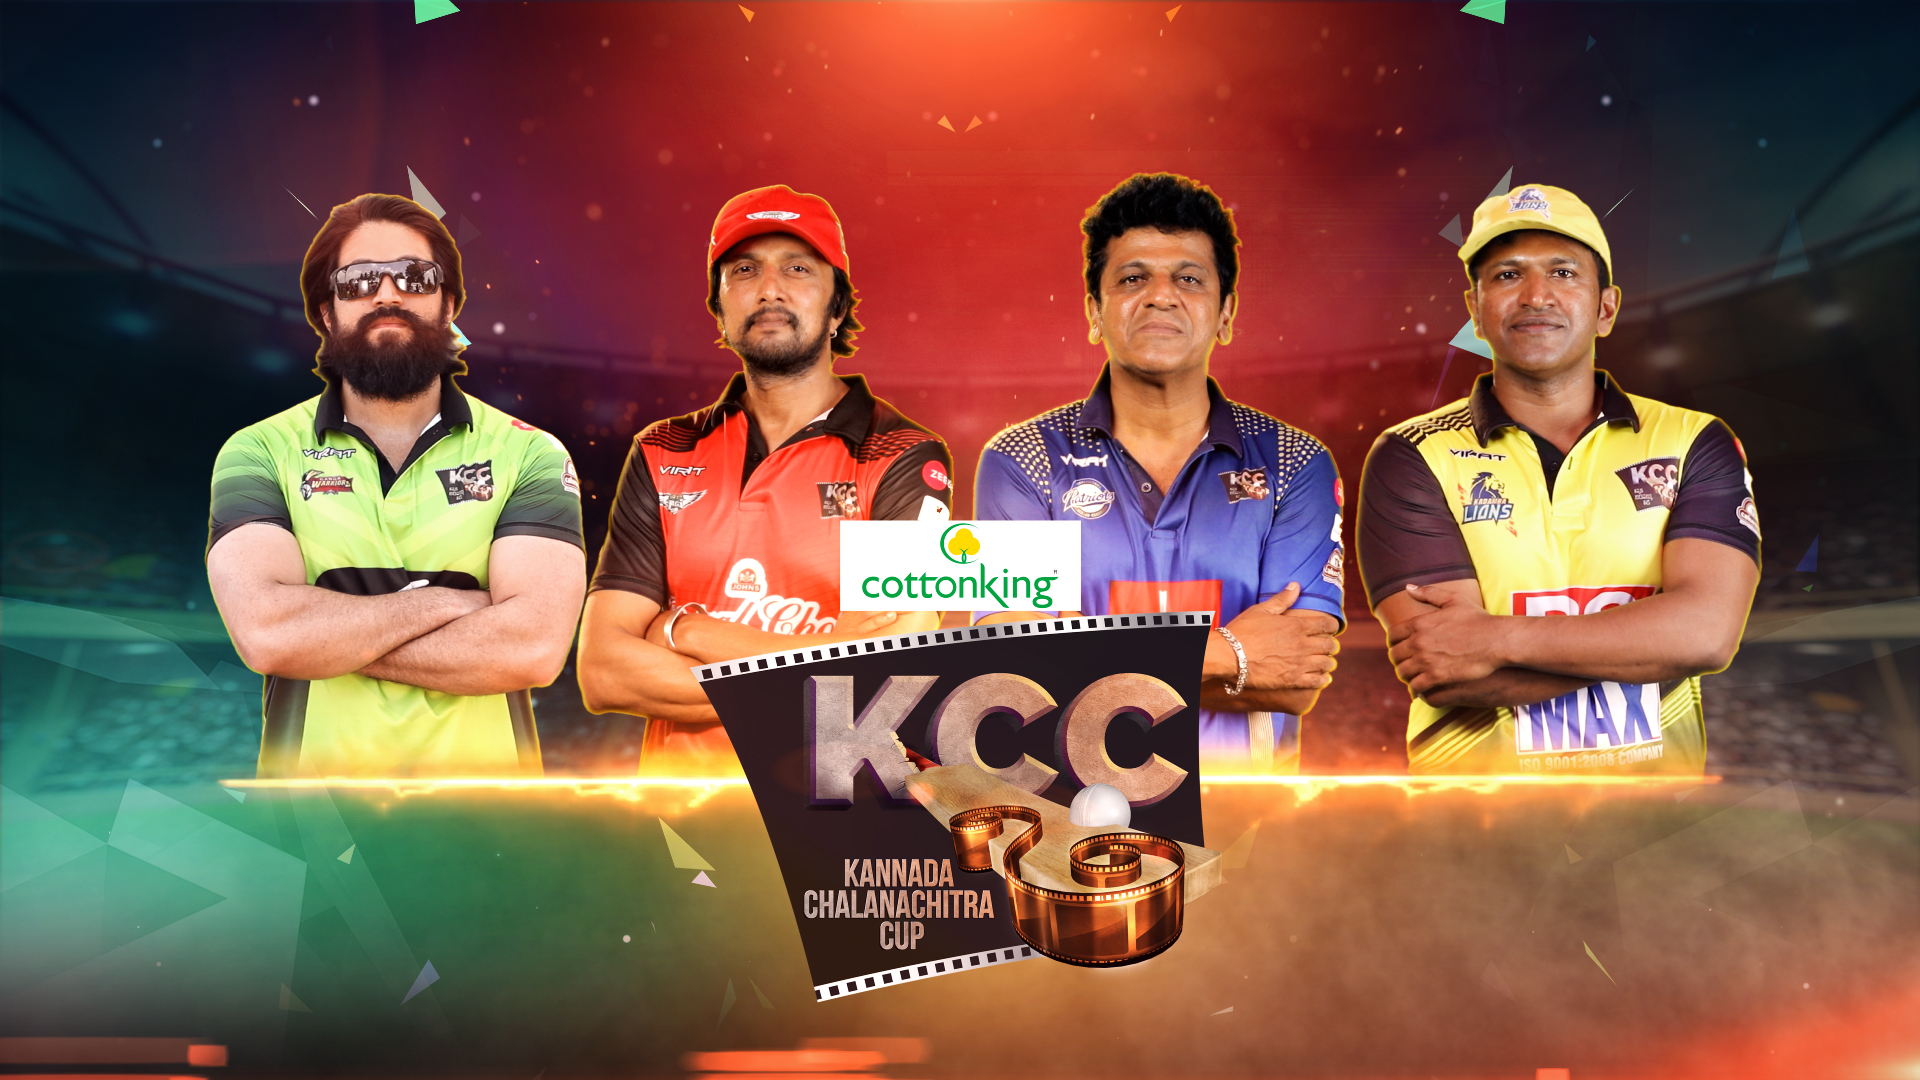 kcc cricket kannada ಗೆ ಚಿತ್ರದ ಫಲಿತಾಂಶ